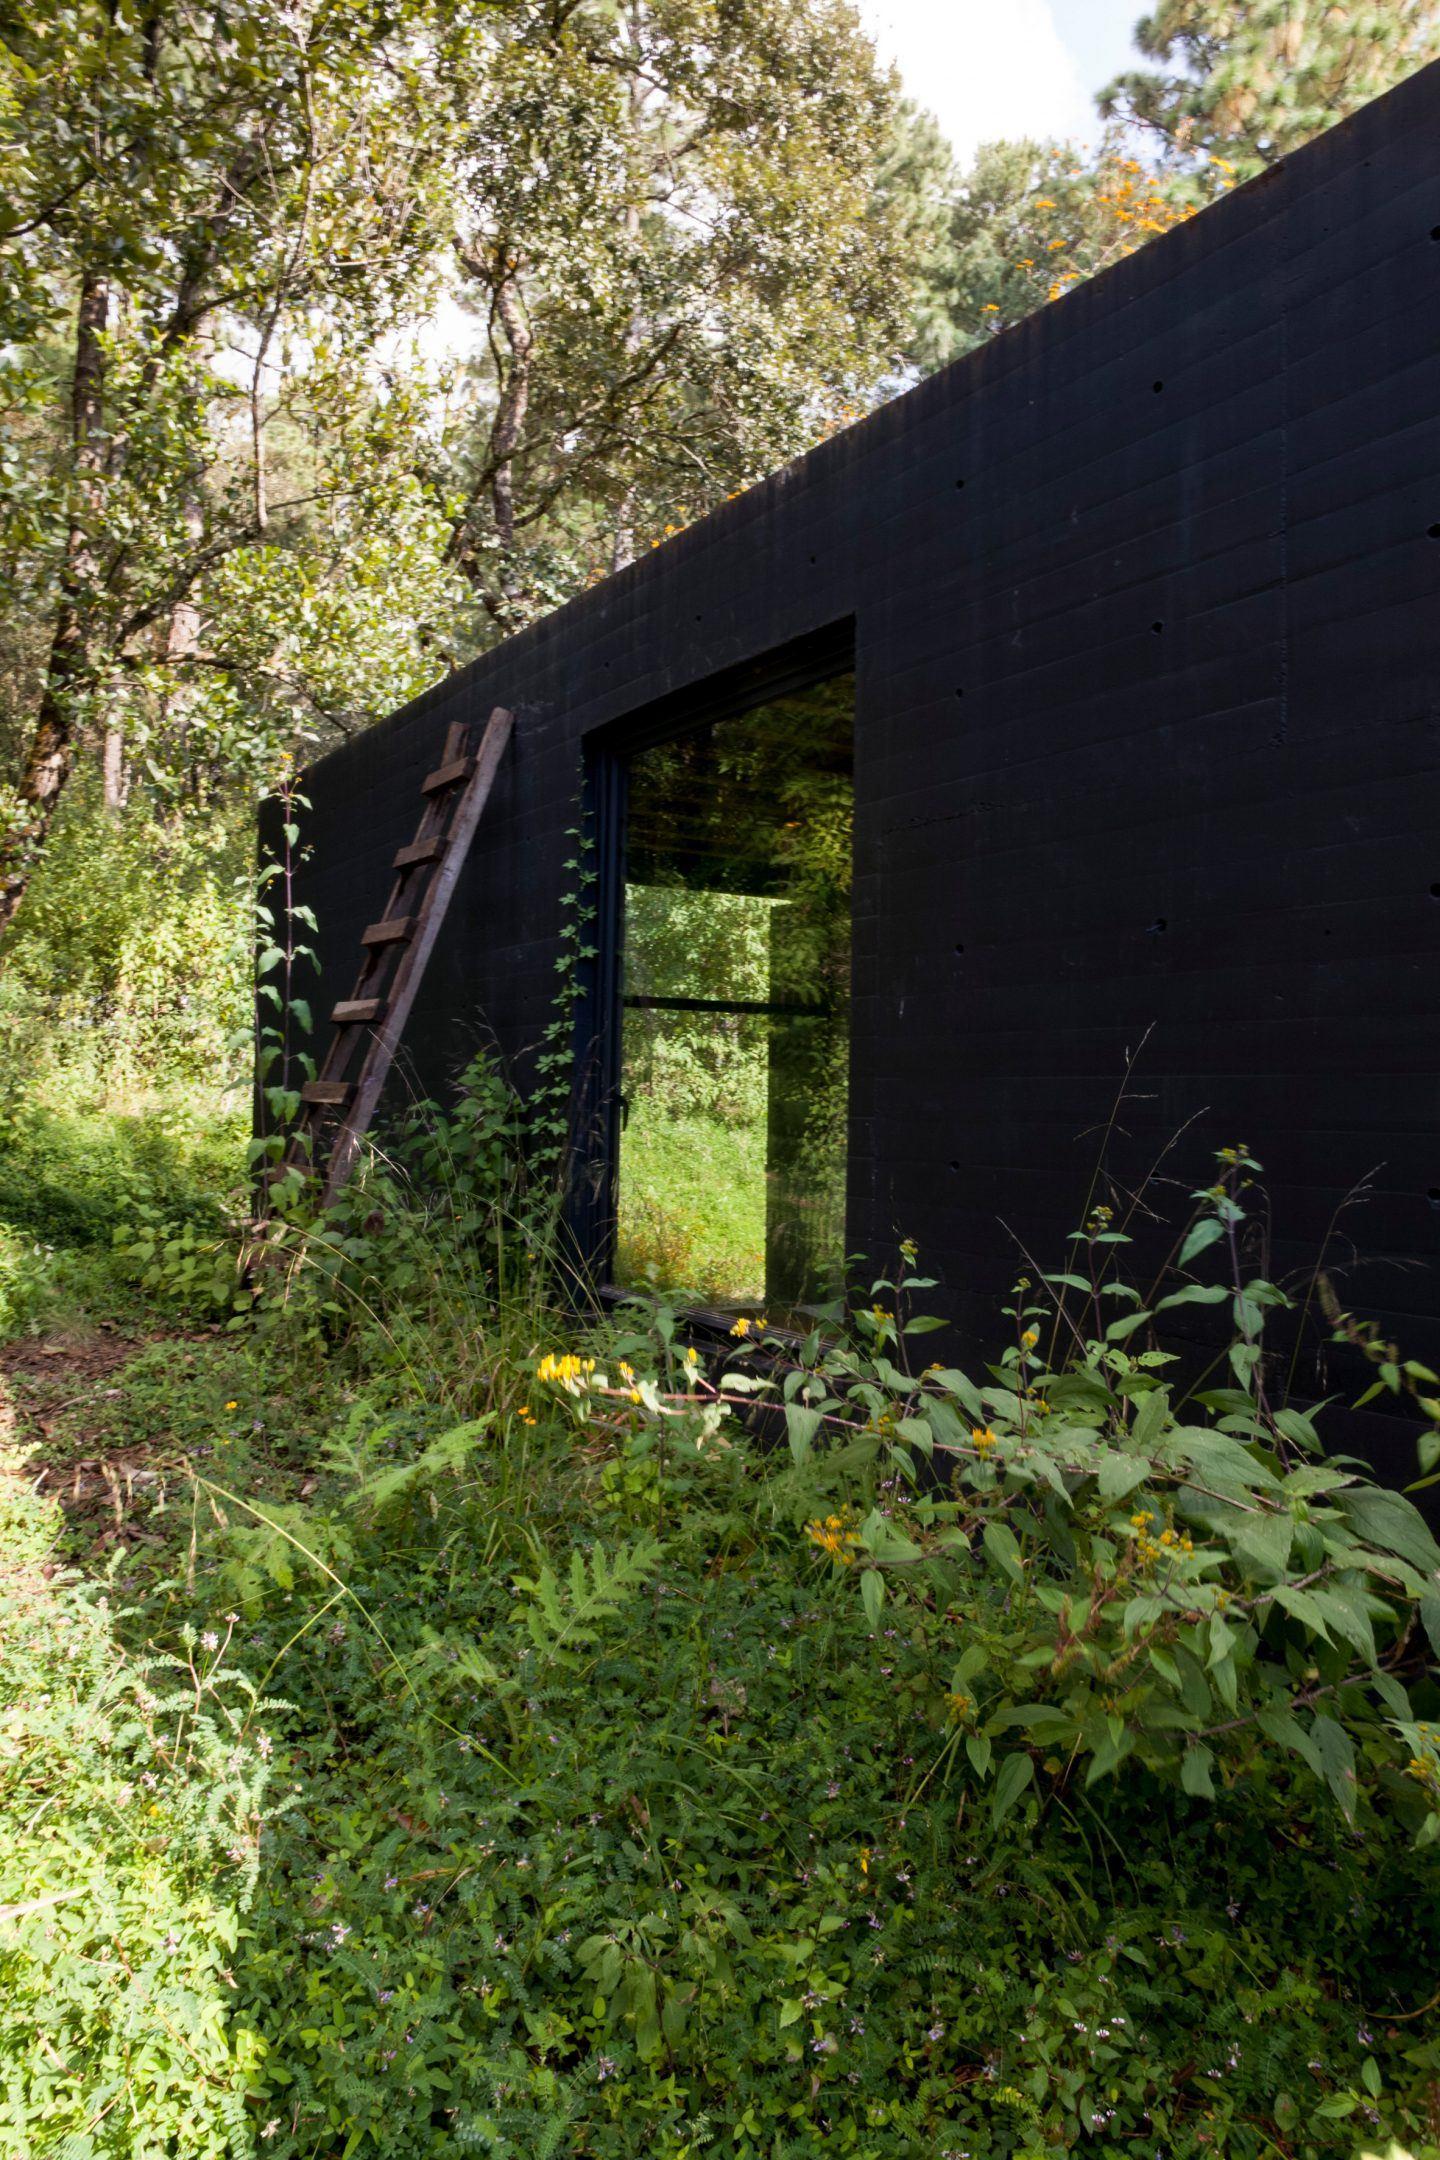 IGNANT-Architecture-Cadaval-Sola-Morales-Casa-De-La-Roca-17